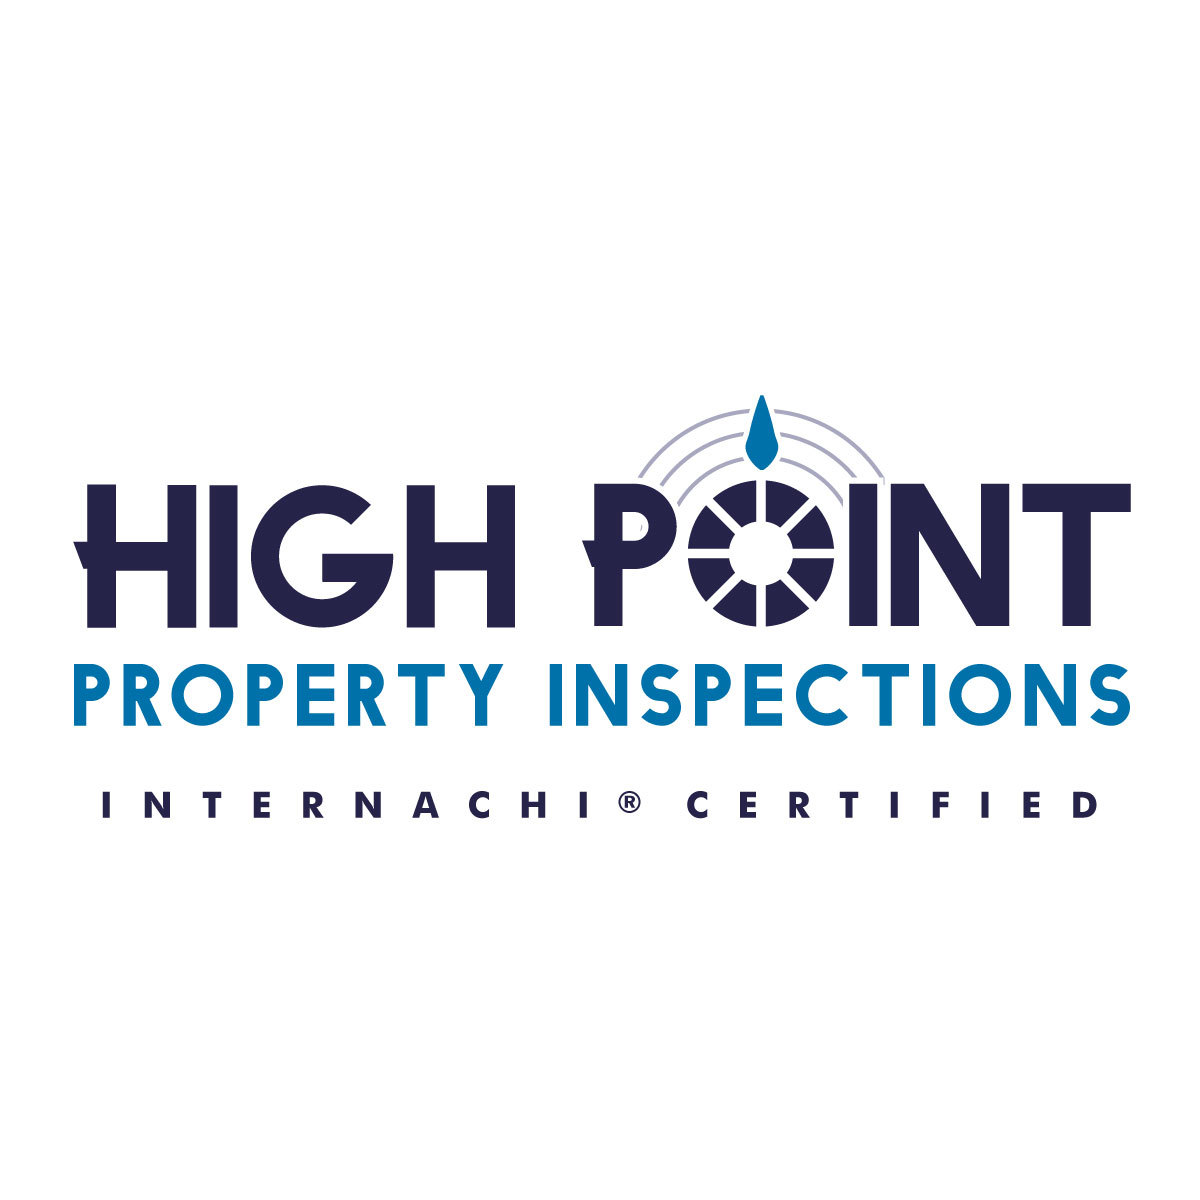 High point home inspector logo